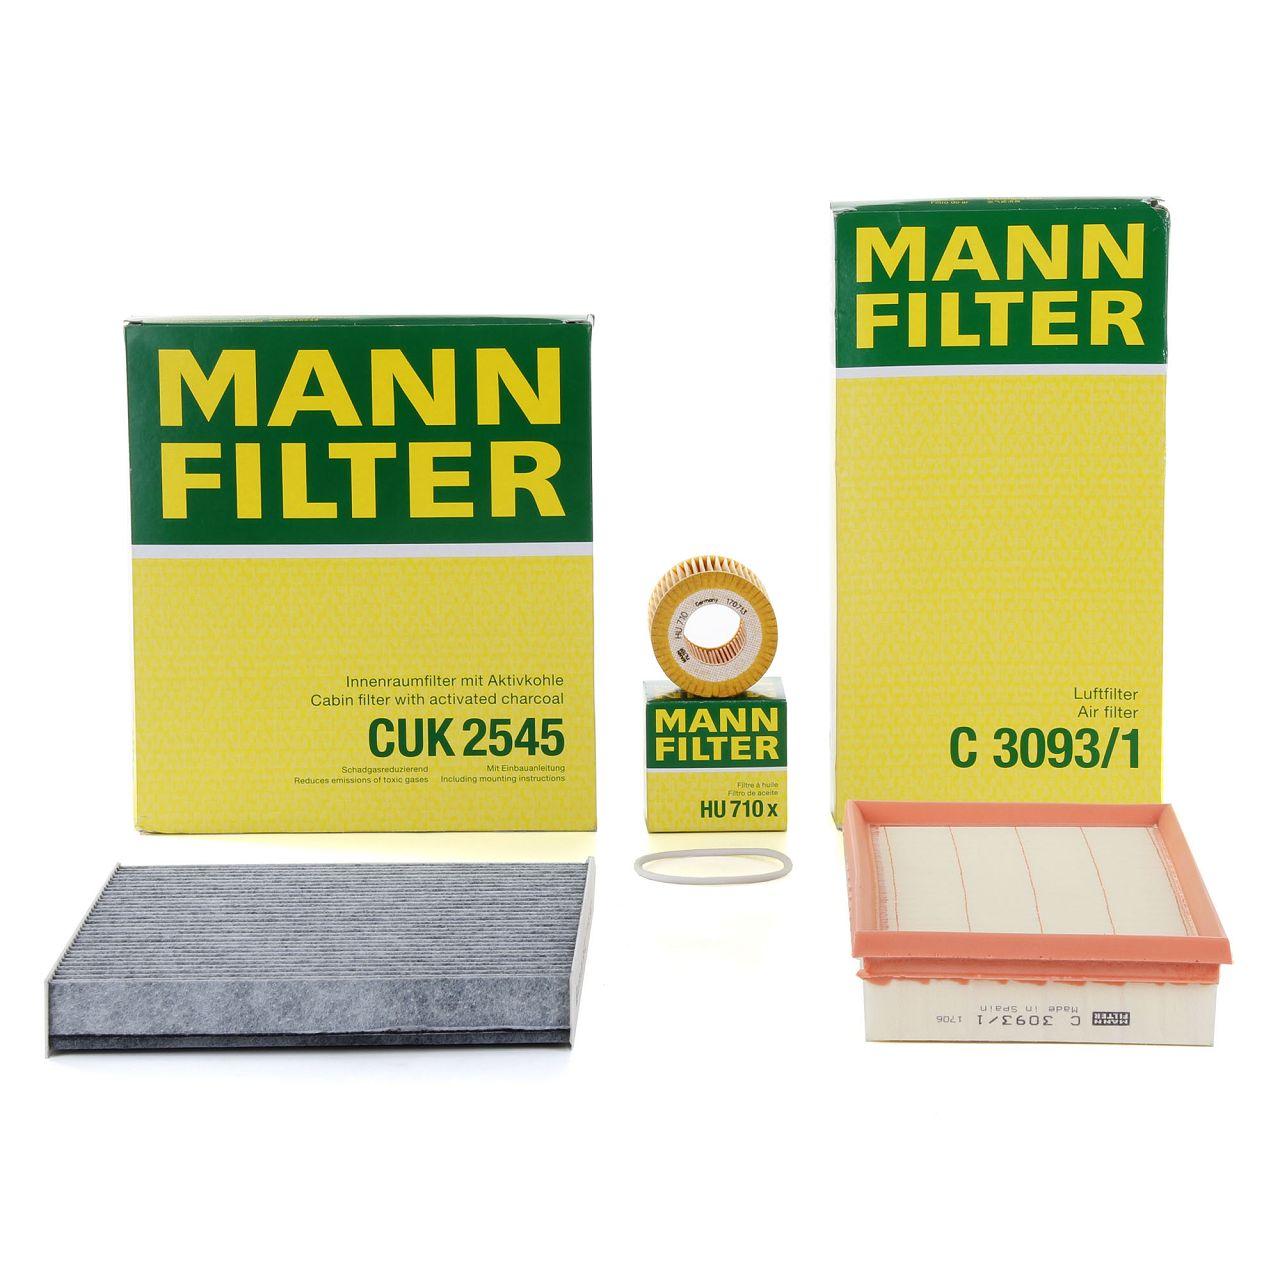 MANN Filterset für SEAT IBIZA IV SKODA FABIA I ROOMSTER VW POLO (9N) 1.2 64 PS